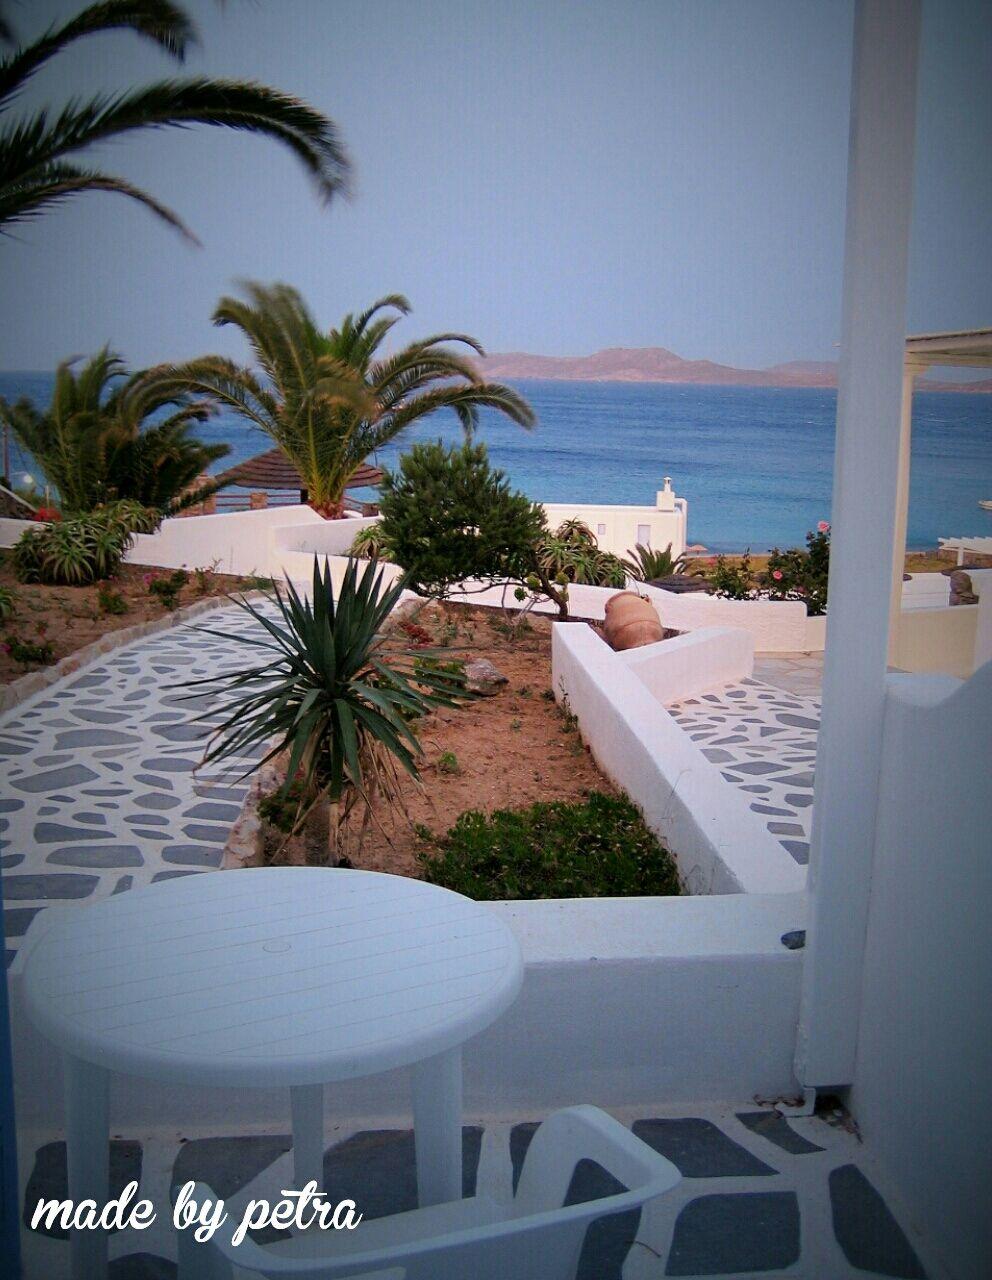 Hotel manoula s beach mykonos